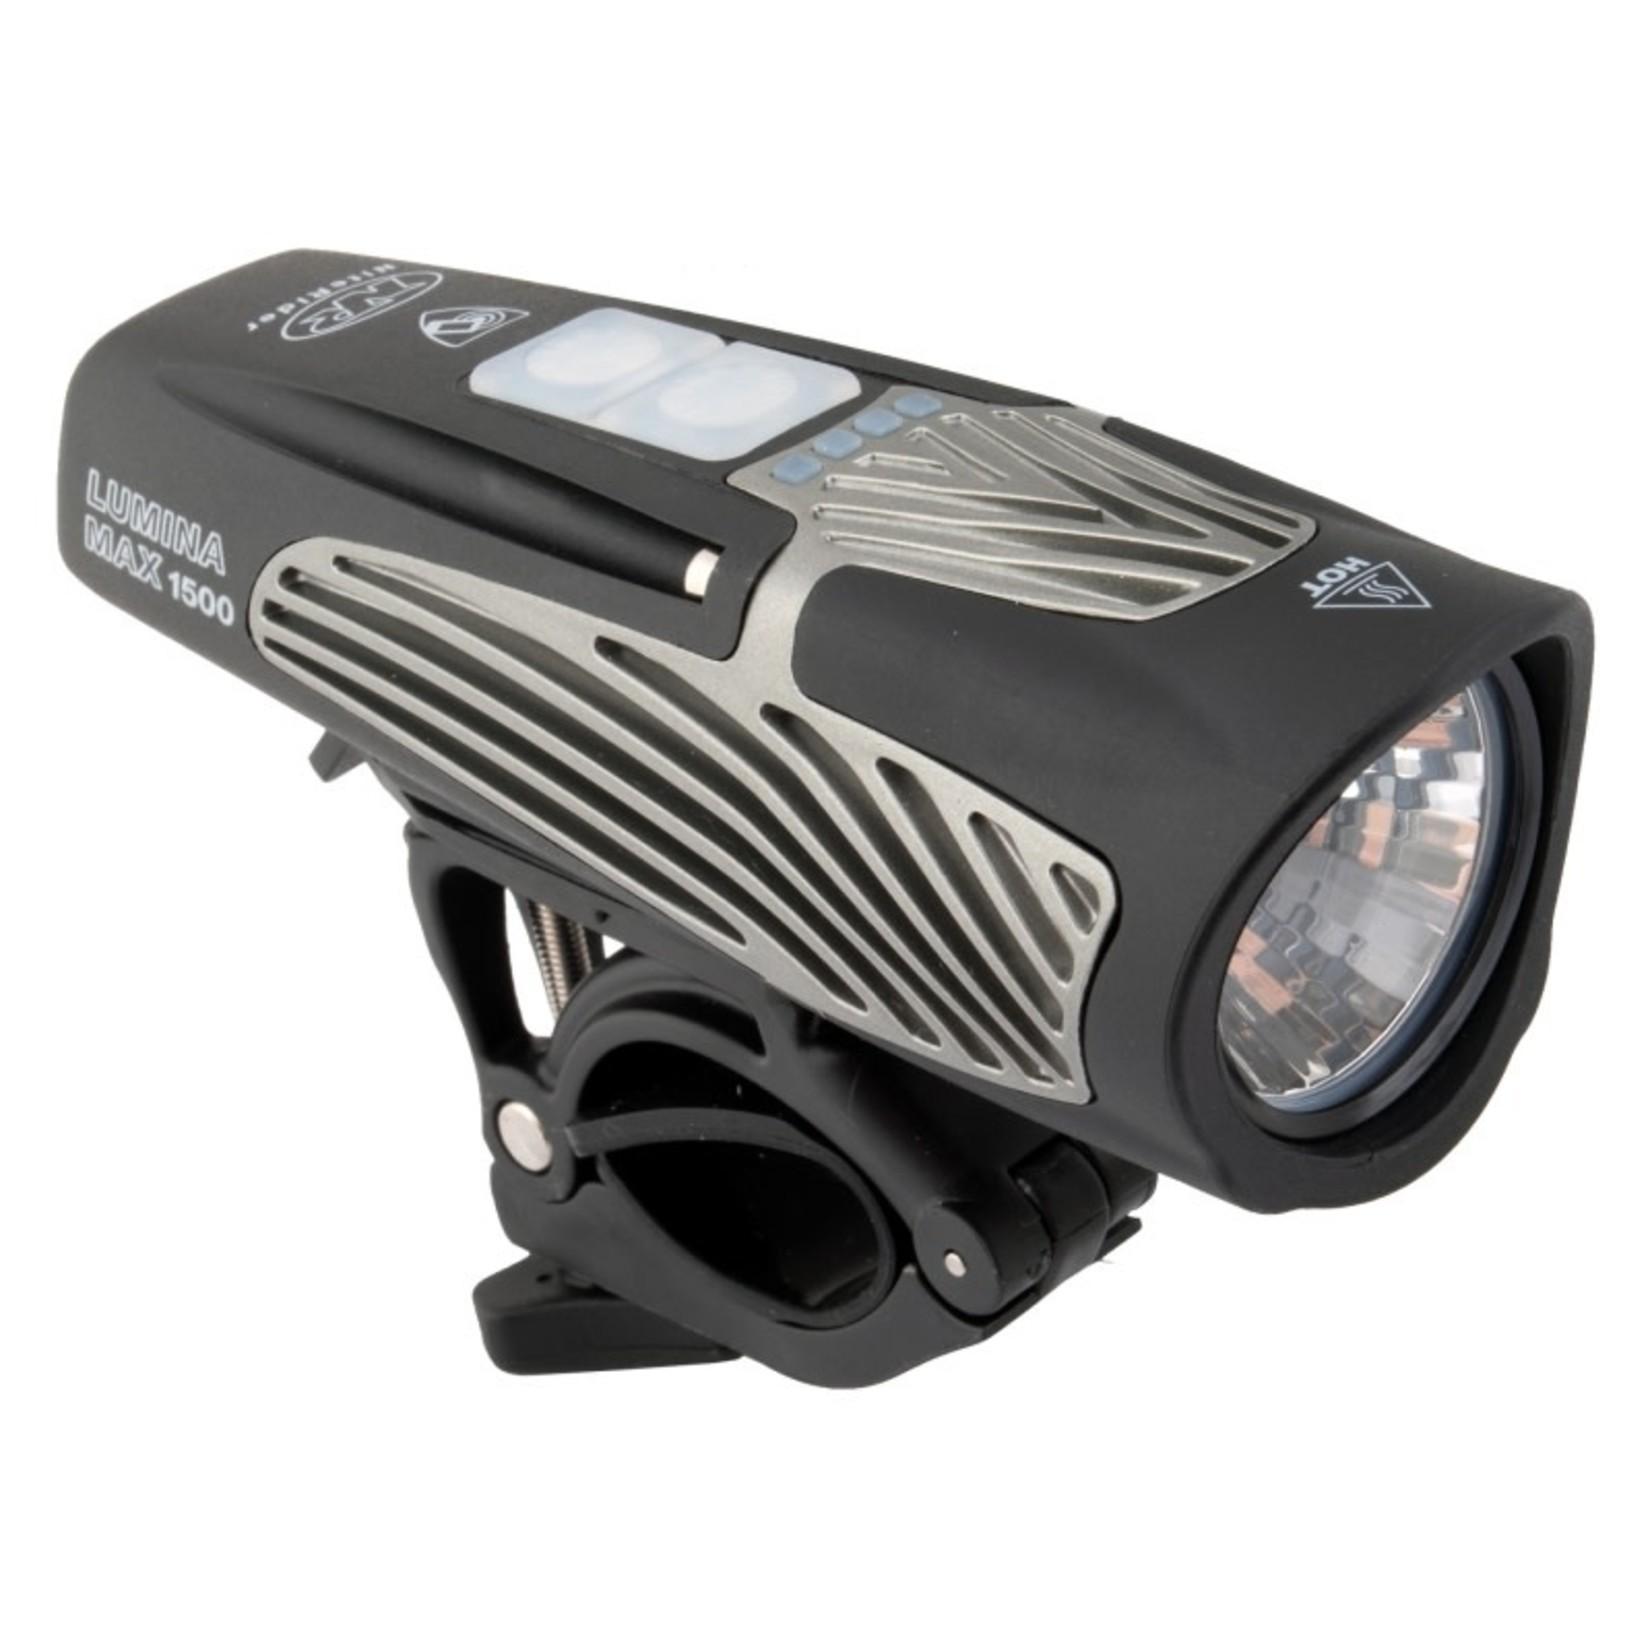 LIGHT NITERIDER FT LUMINA MAX 1500 w/NITELINK